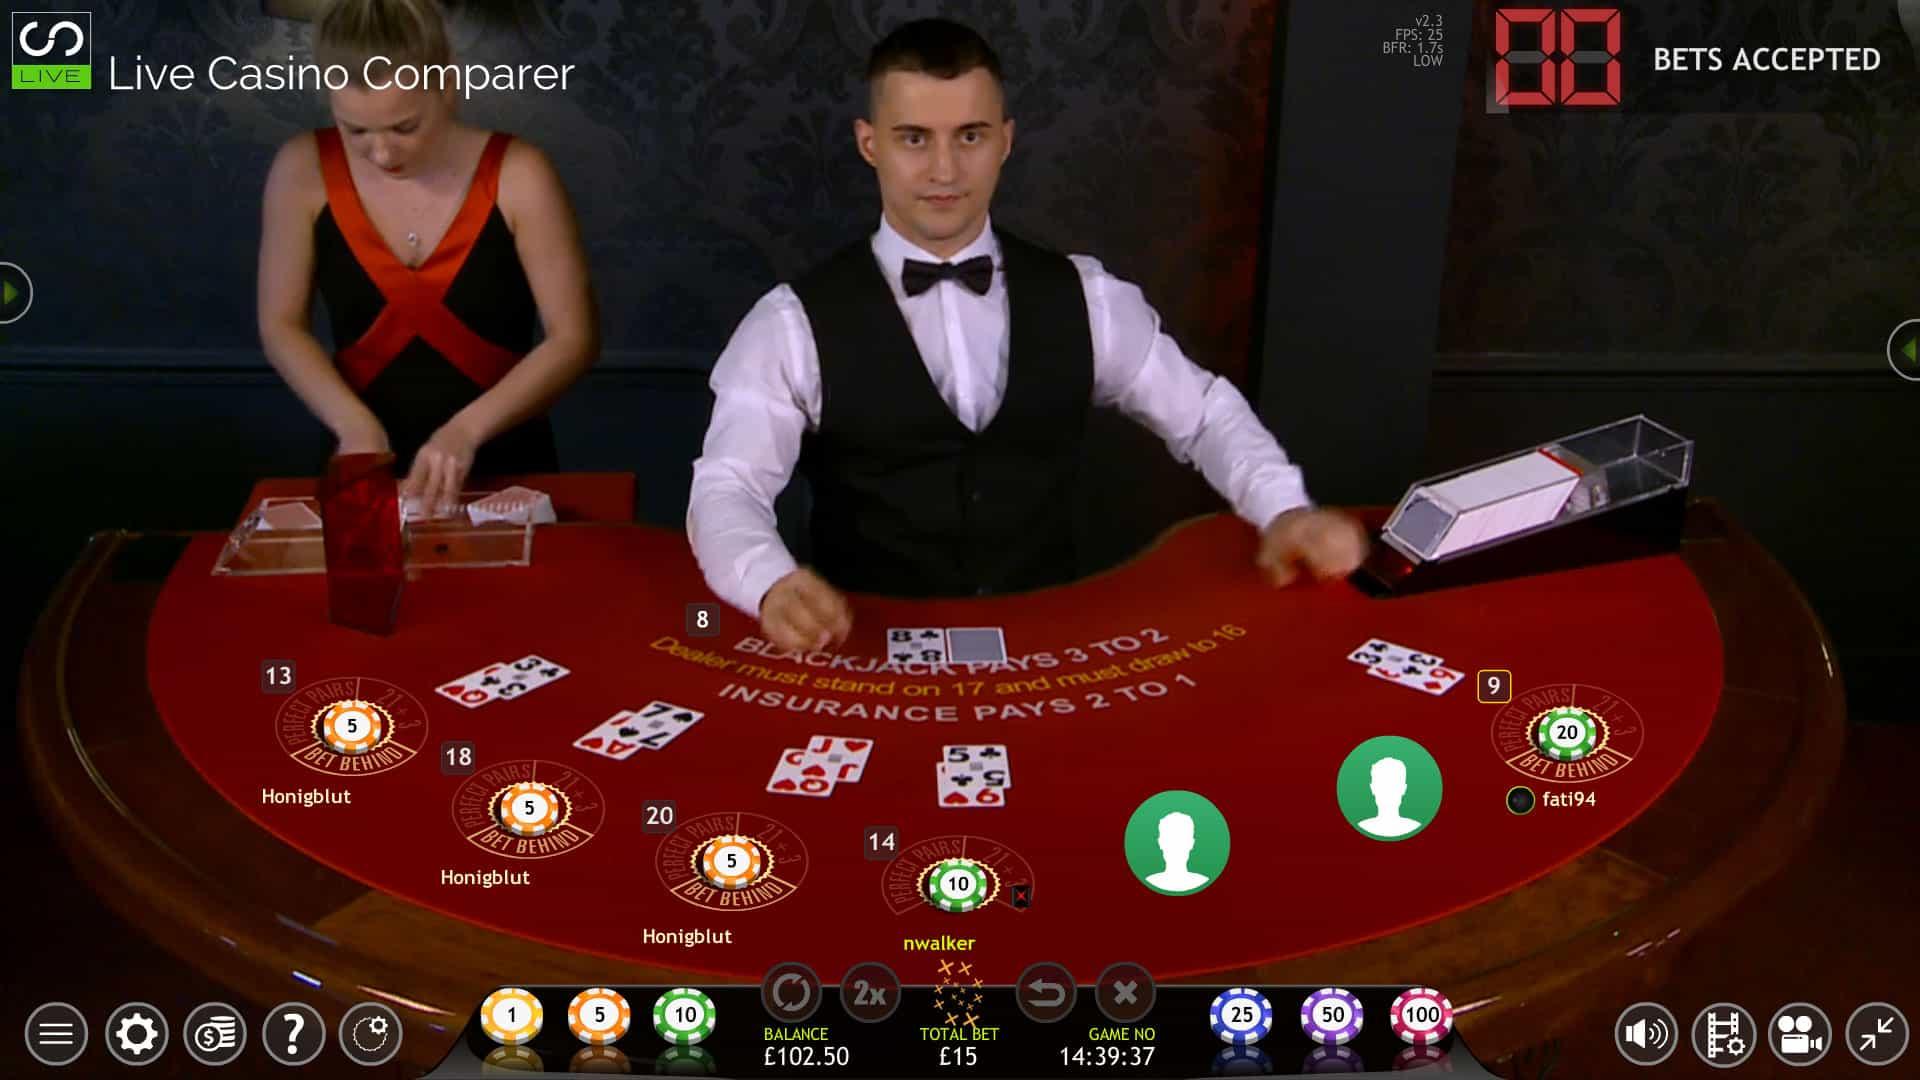 Blackjack table wallpaper - Extreme Live Blackjack Red Table